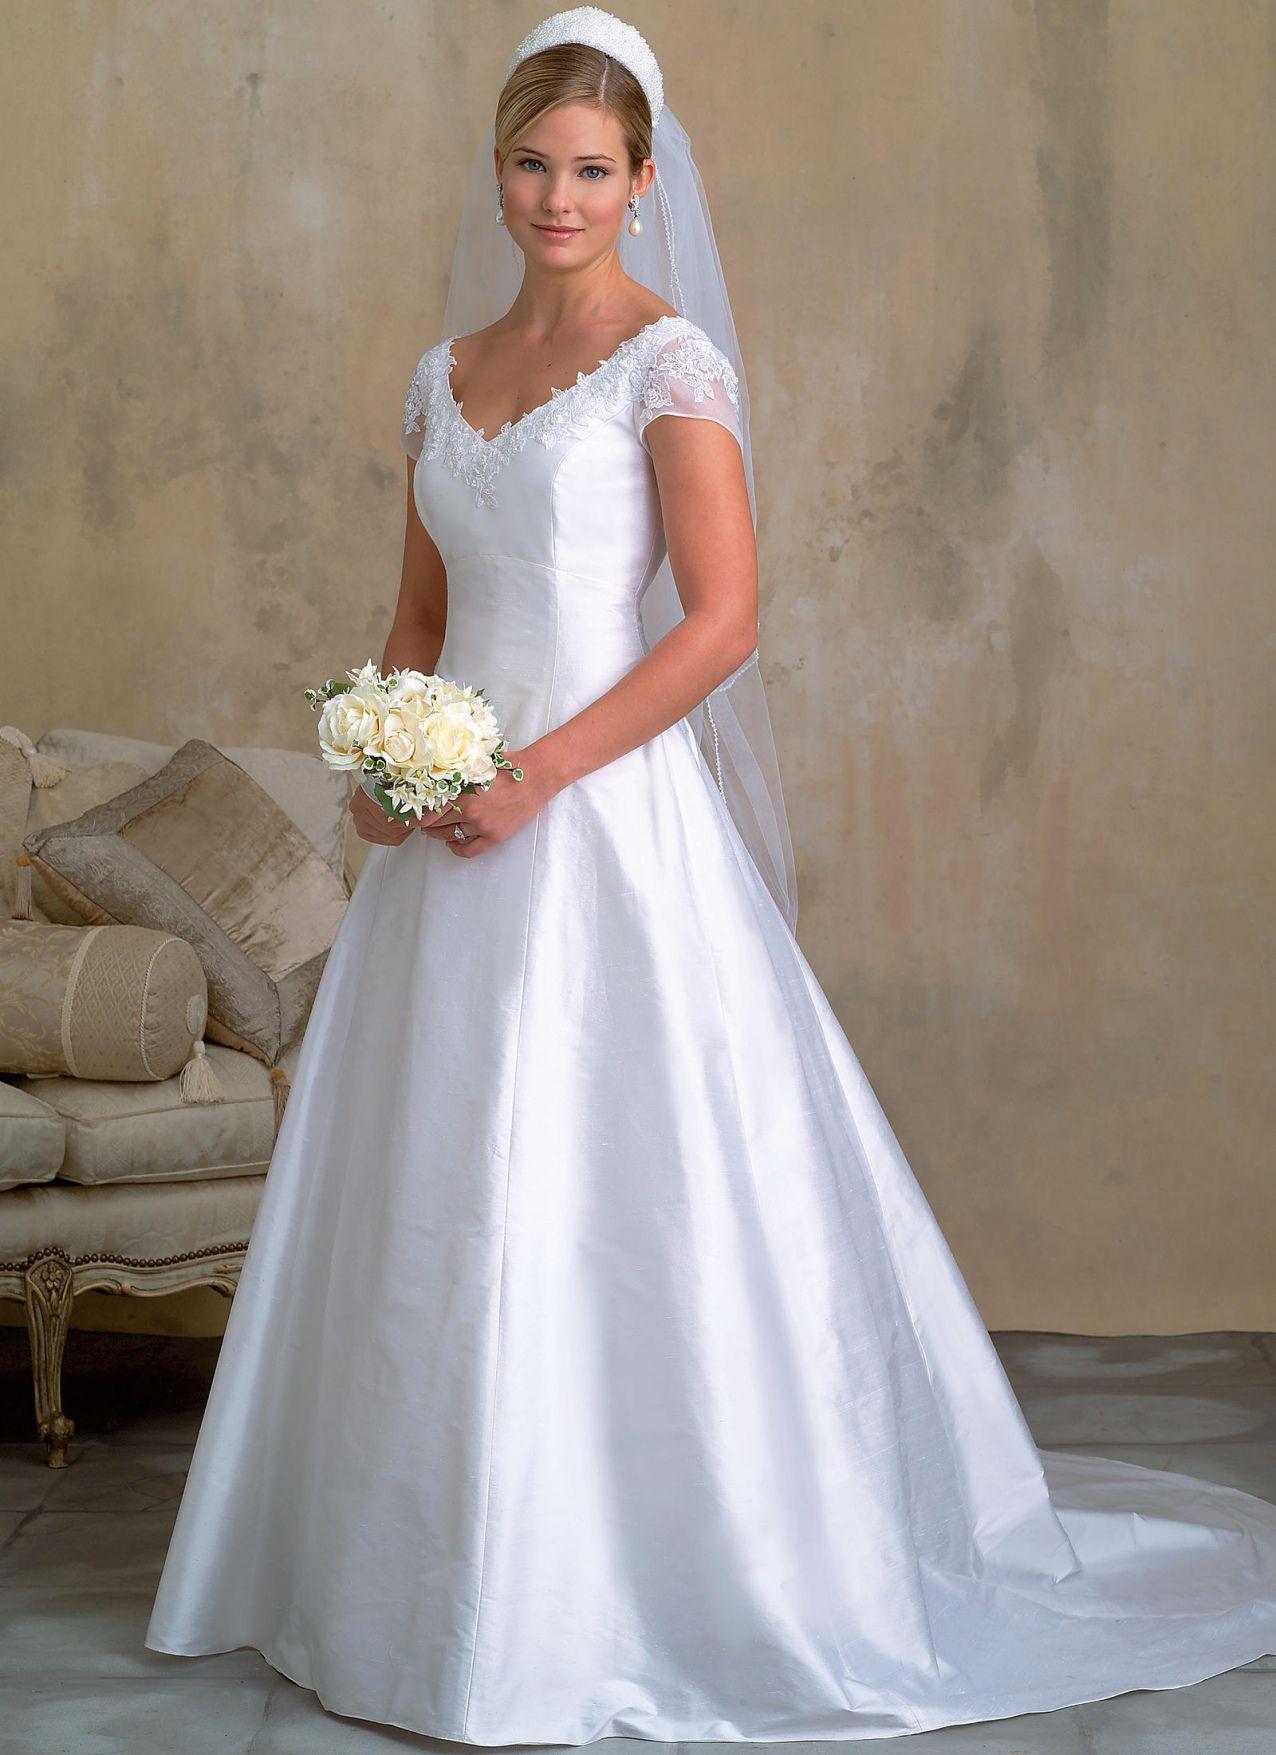 77+ Wedding Dress Sewing Patterns - Best Wedding Dress for Pear ...